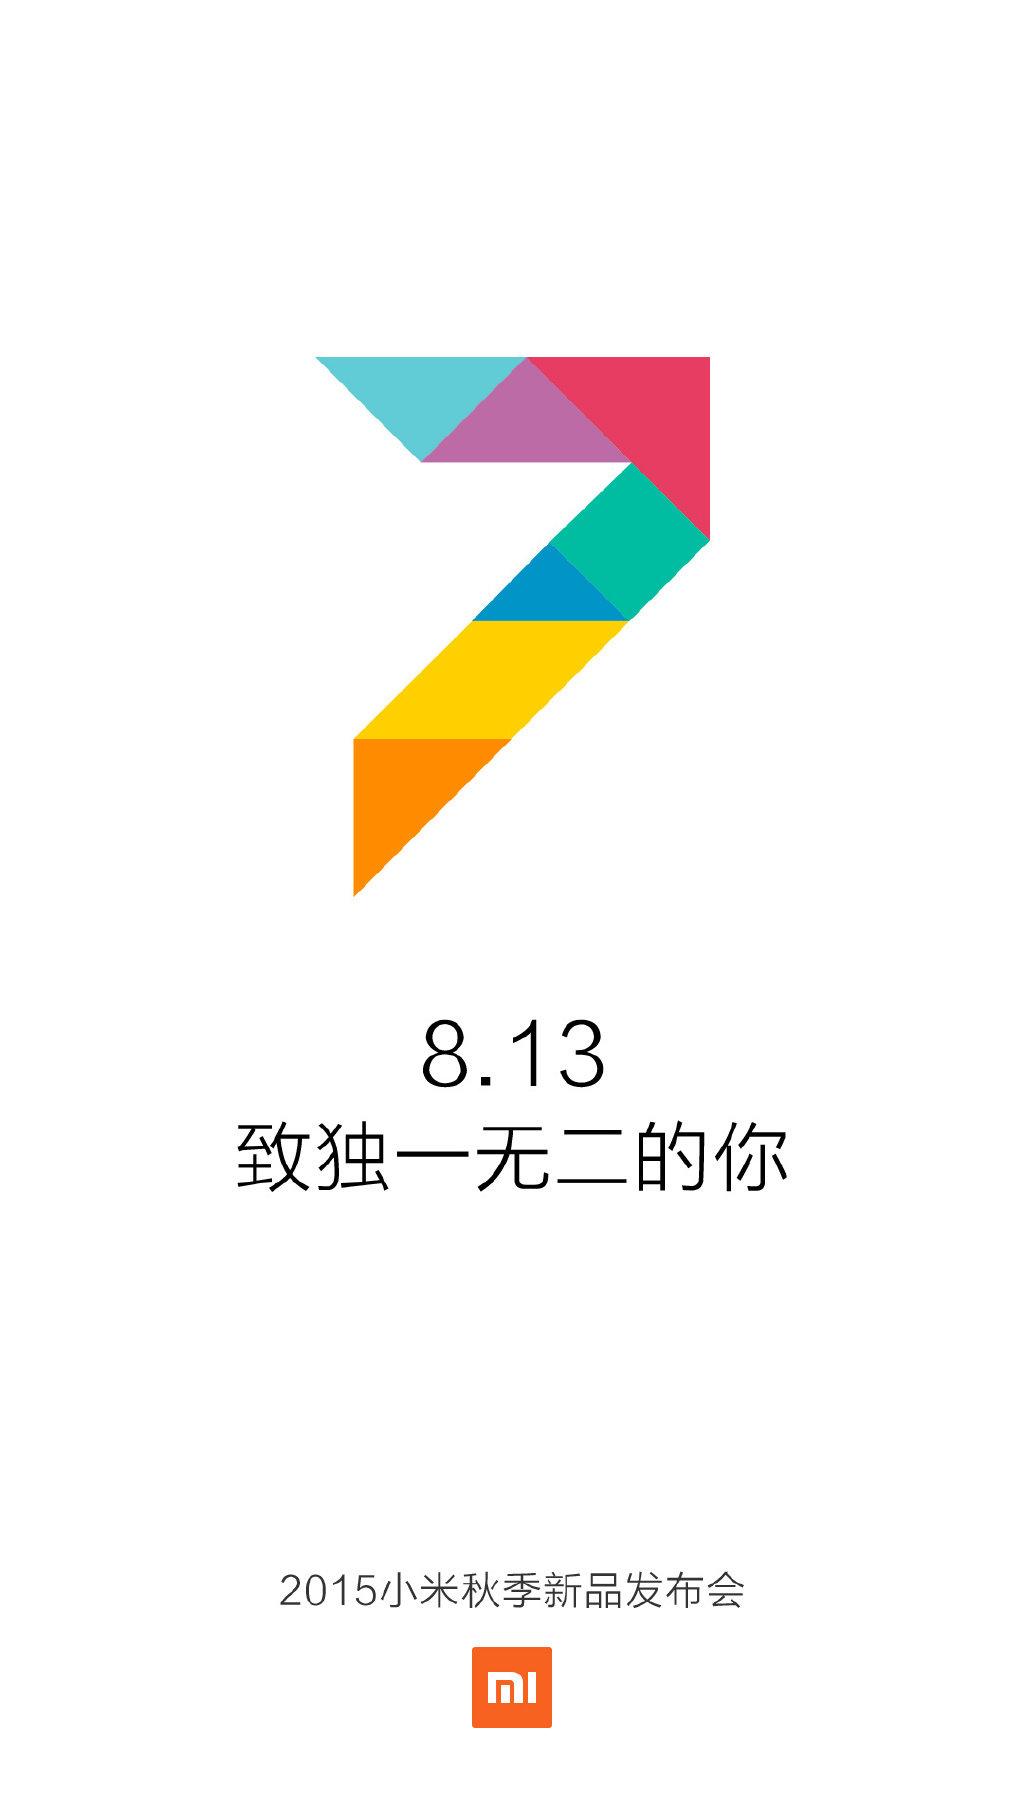 MIUI 7将至:小米8月13日召开秋季发布会的照片 - 3